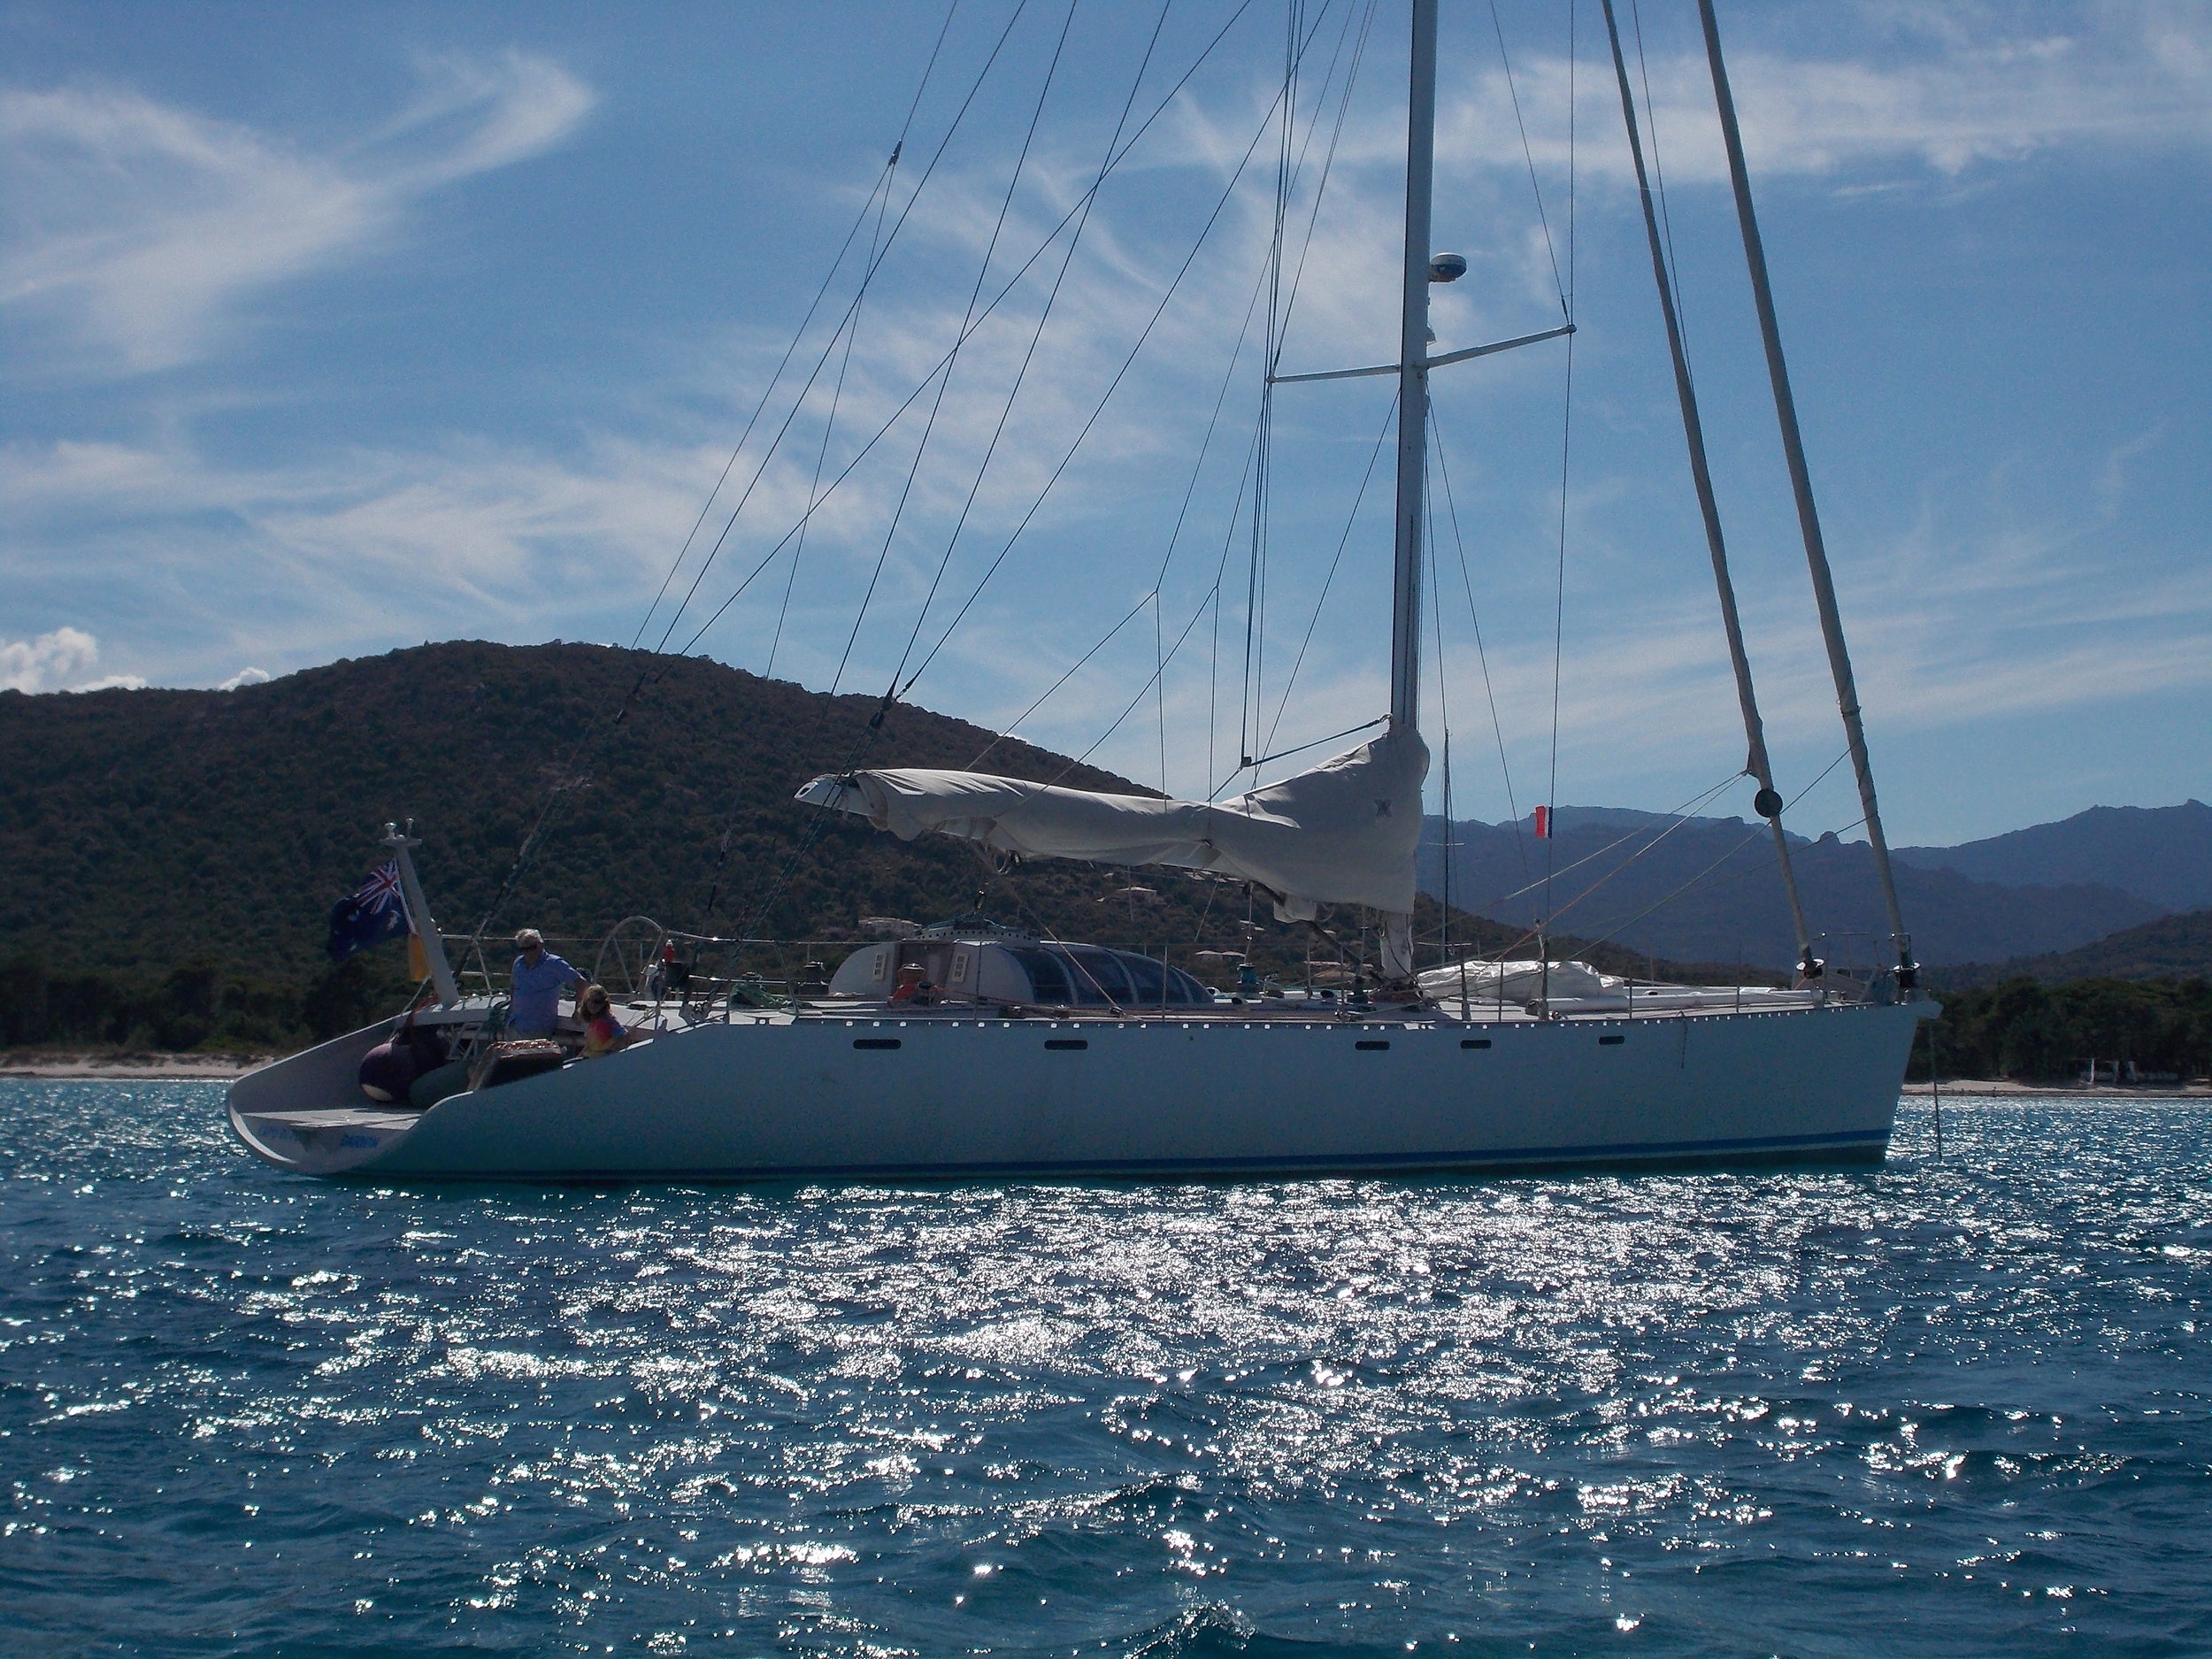 Capo di Fora / Finot-Conq 20m  2015: Yacht Purchase (Anasazi Ltda Brokerage)  Consulting  2016: Facnor furling system  NKE marine electronics  2017: Yacht Sale (Anasazi ltda Brokerage)